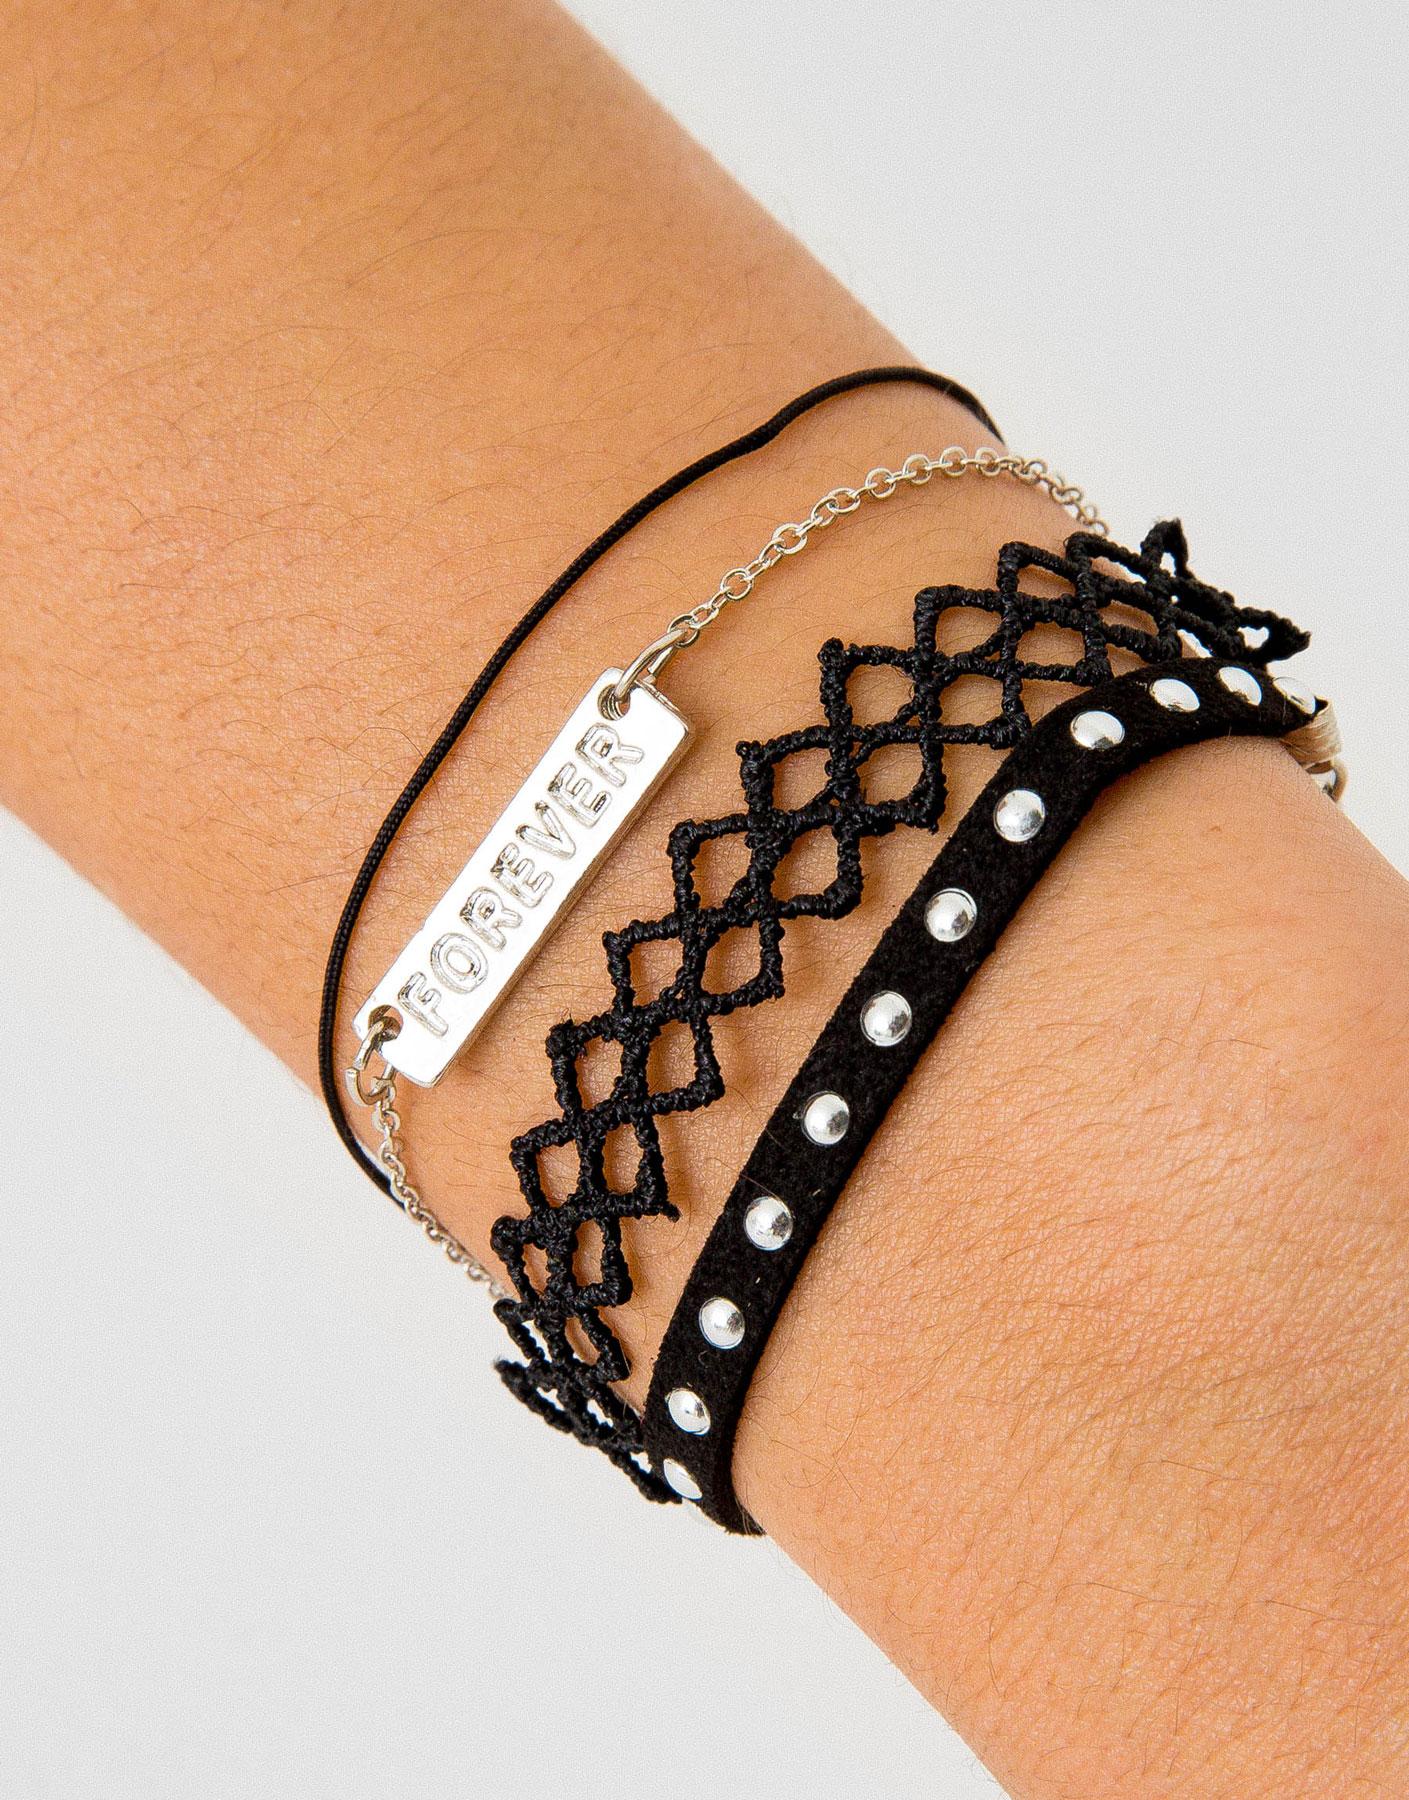 4-pack of bracelets